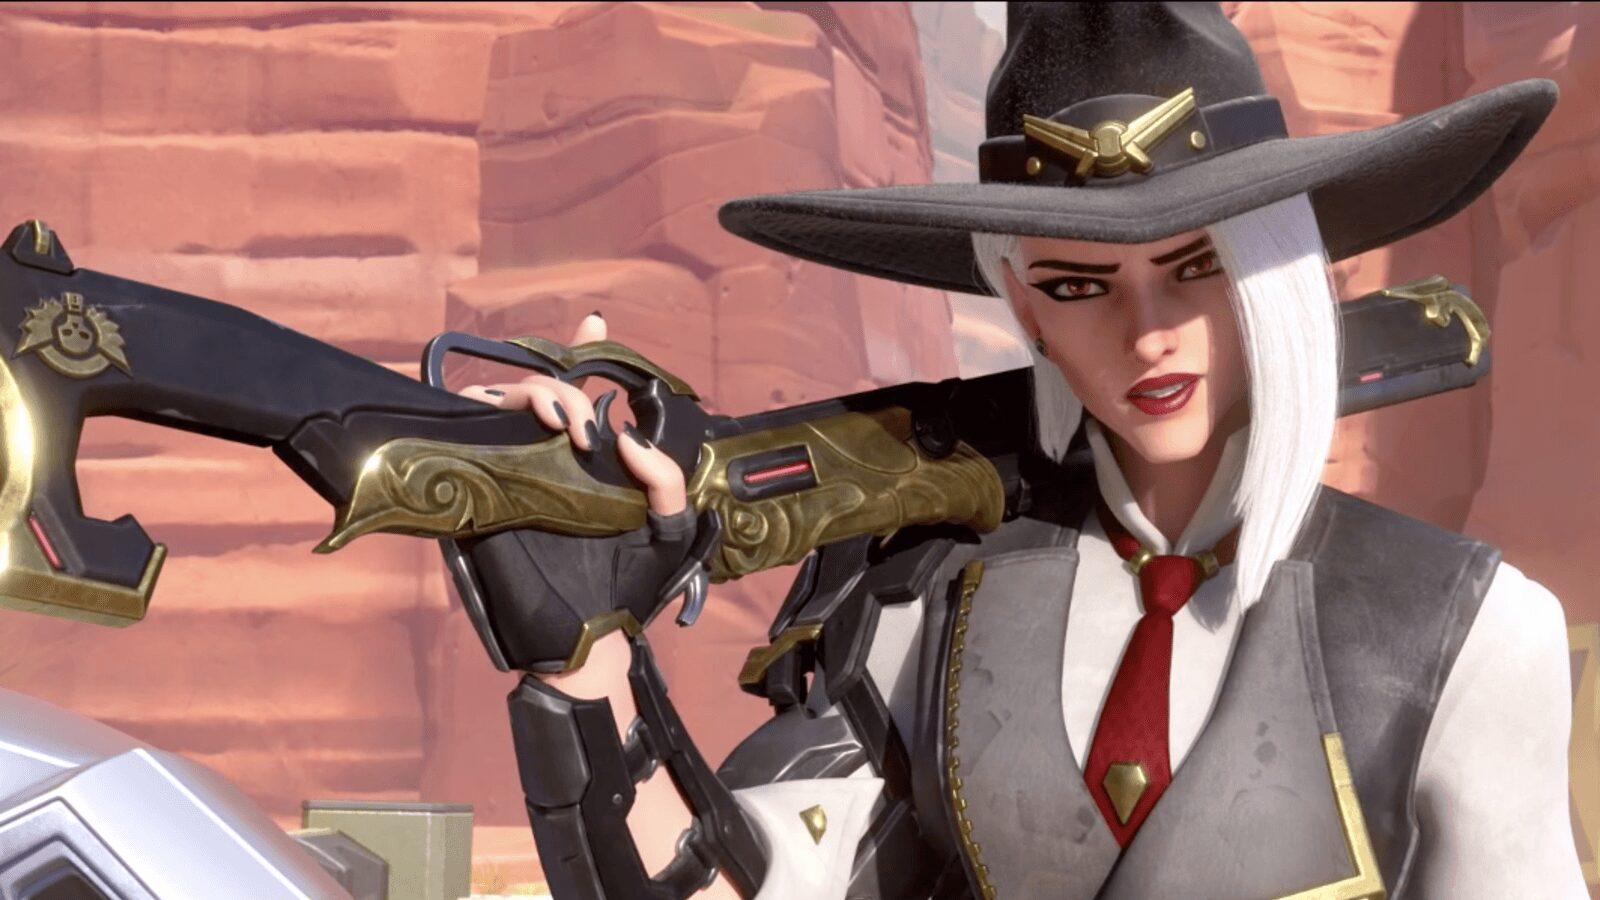 Ashe, nouvelle héroïne dans Overwatch